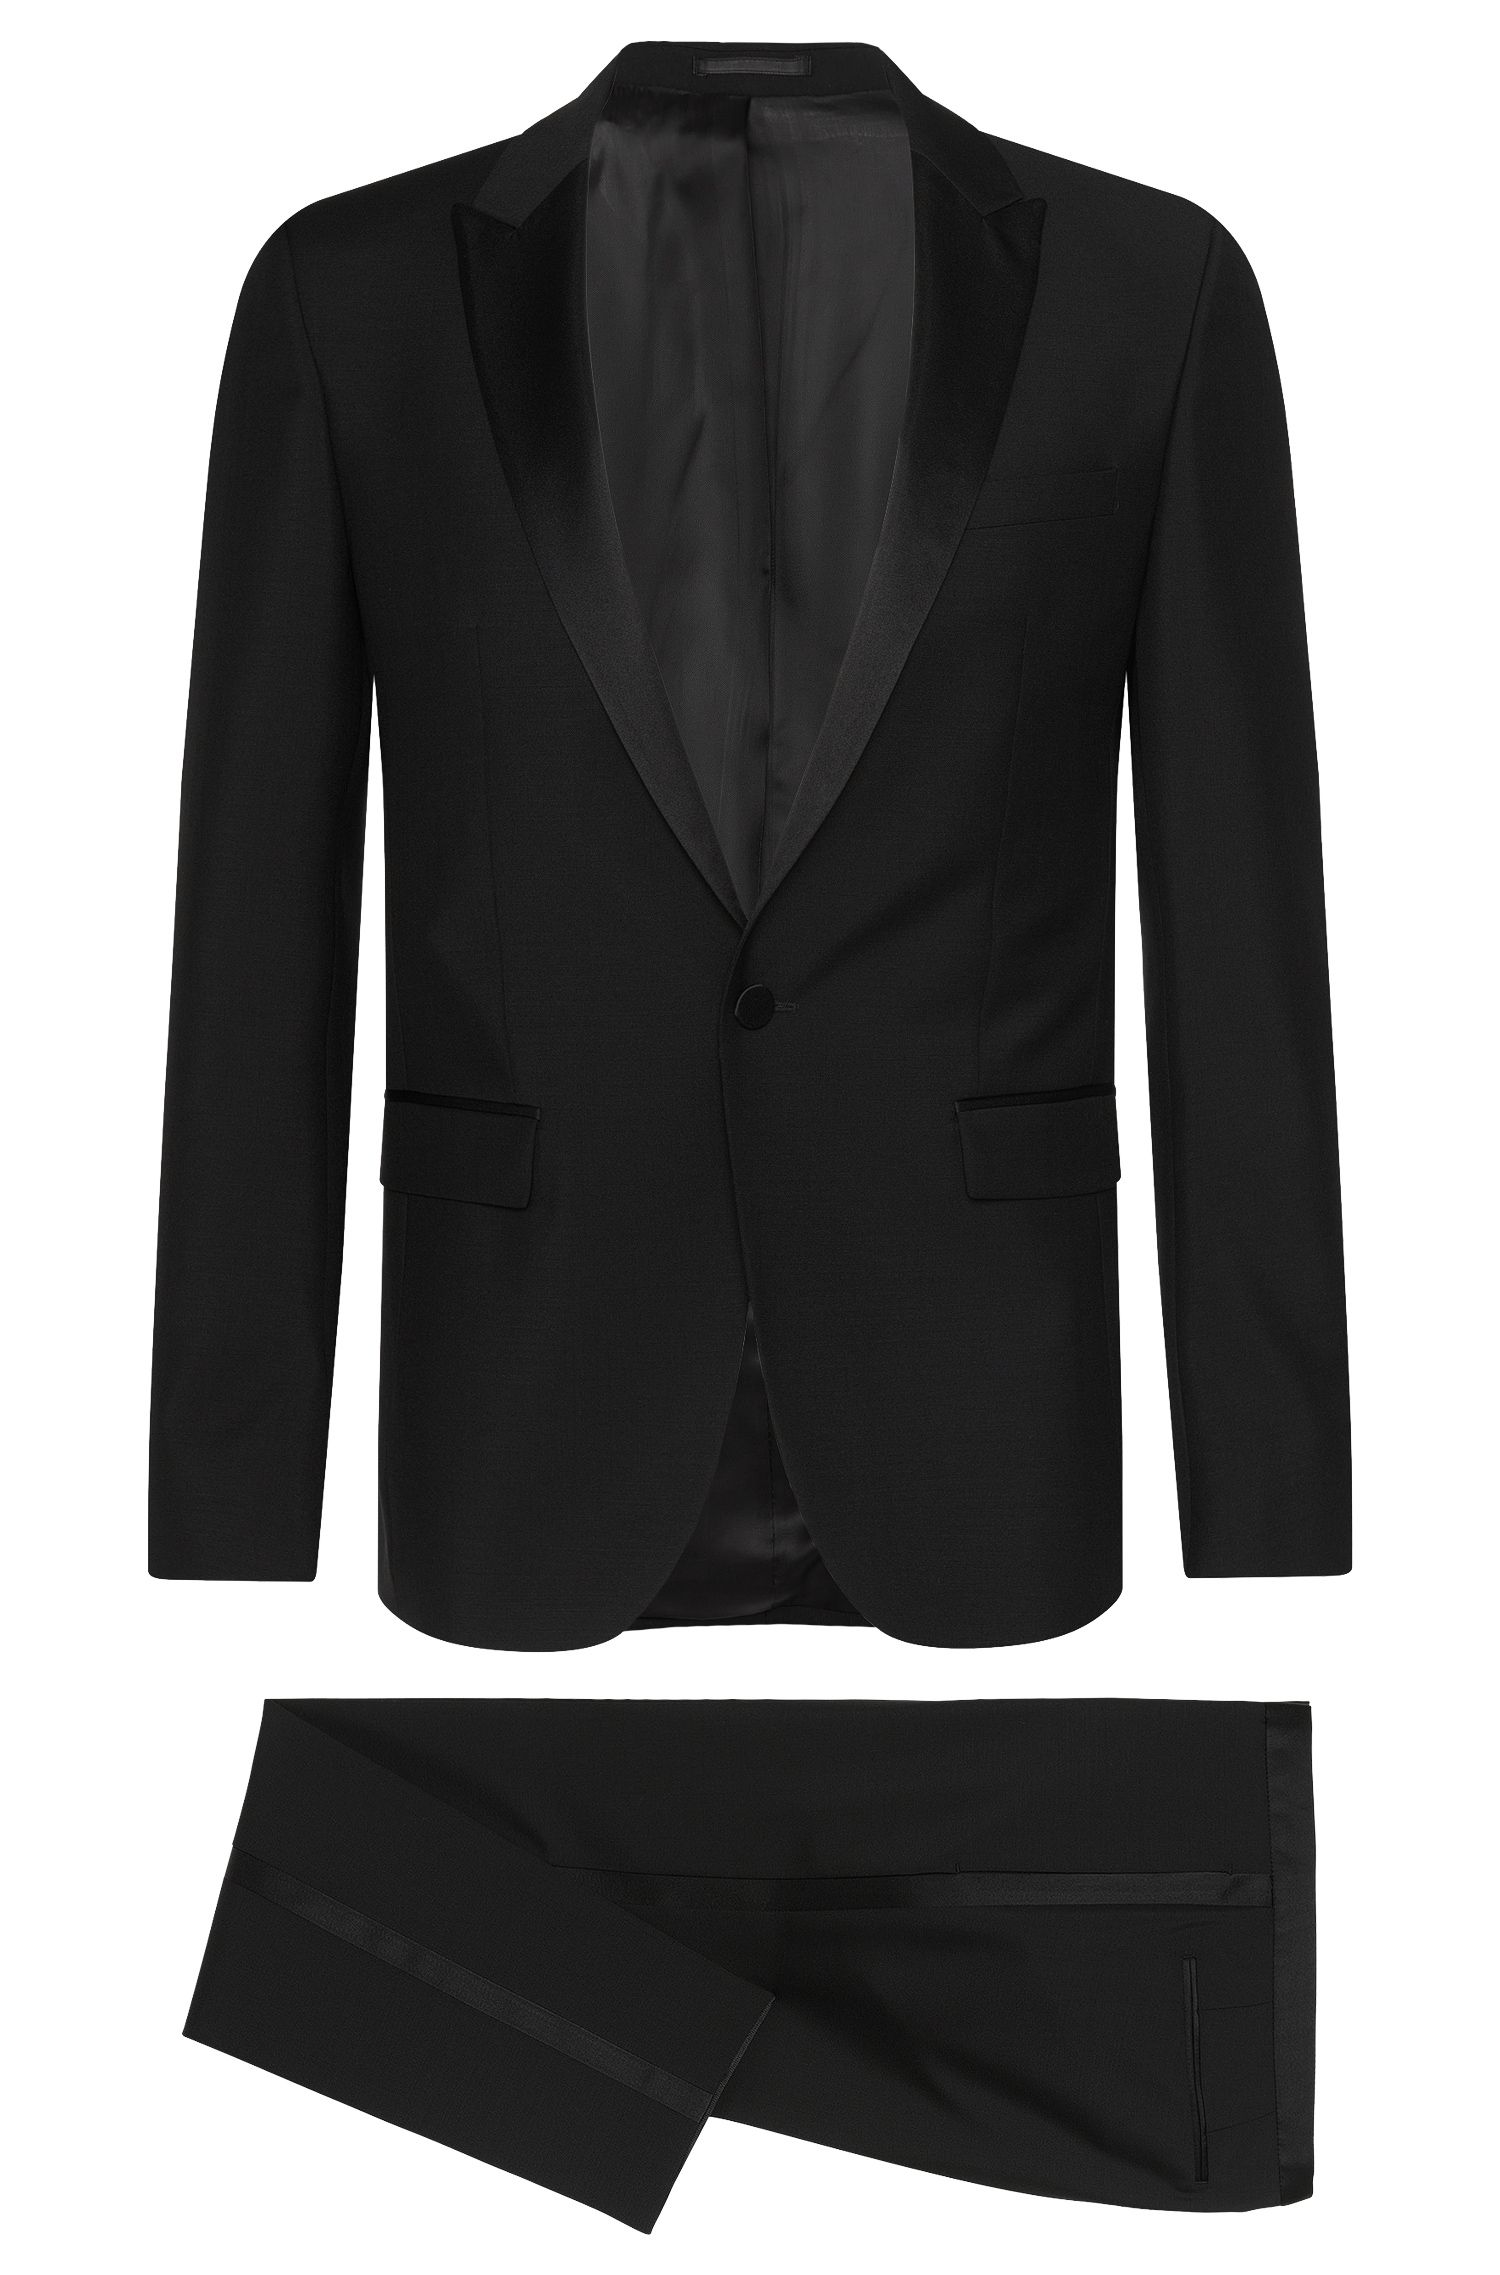 'Reysen/Weever' | Extra-Slim Fit, Italian Virgin Wool Mohair Tuxedo